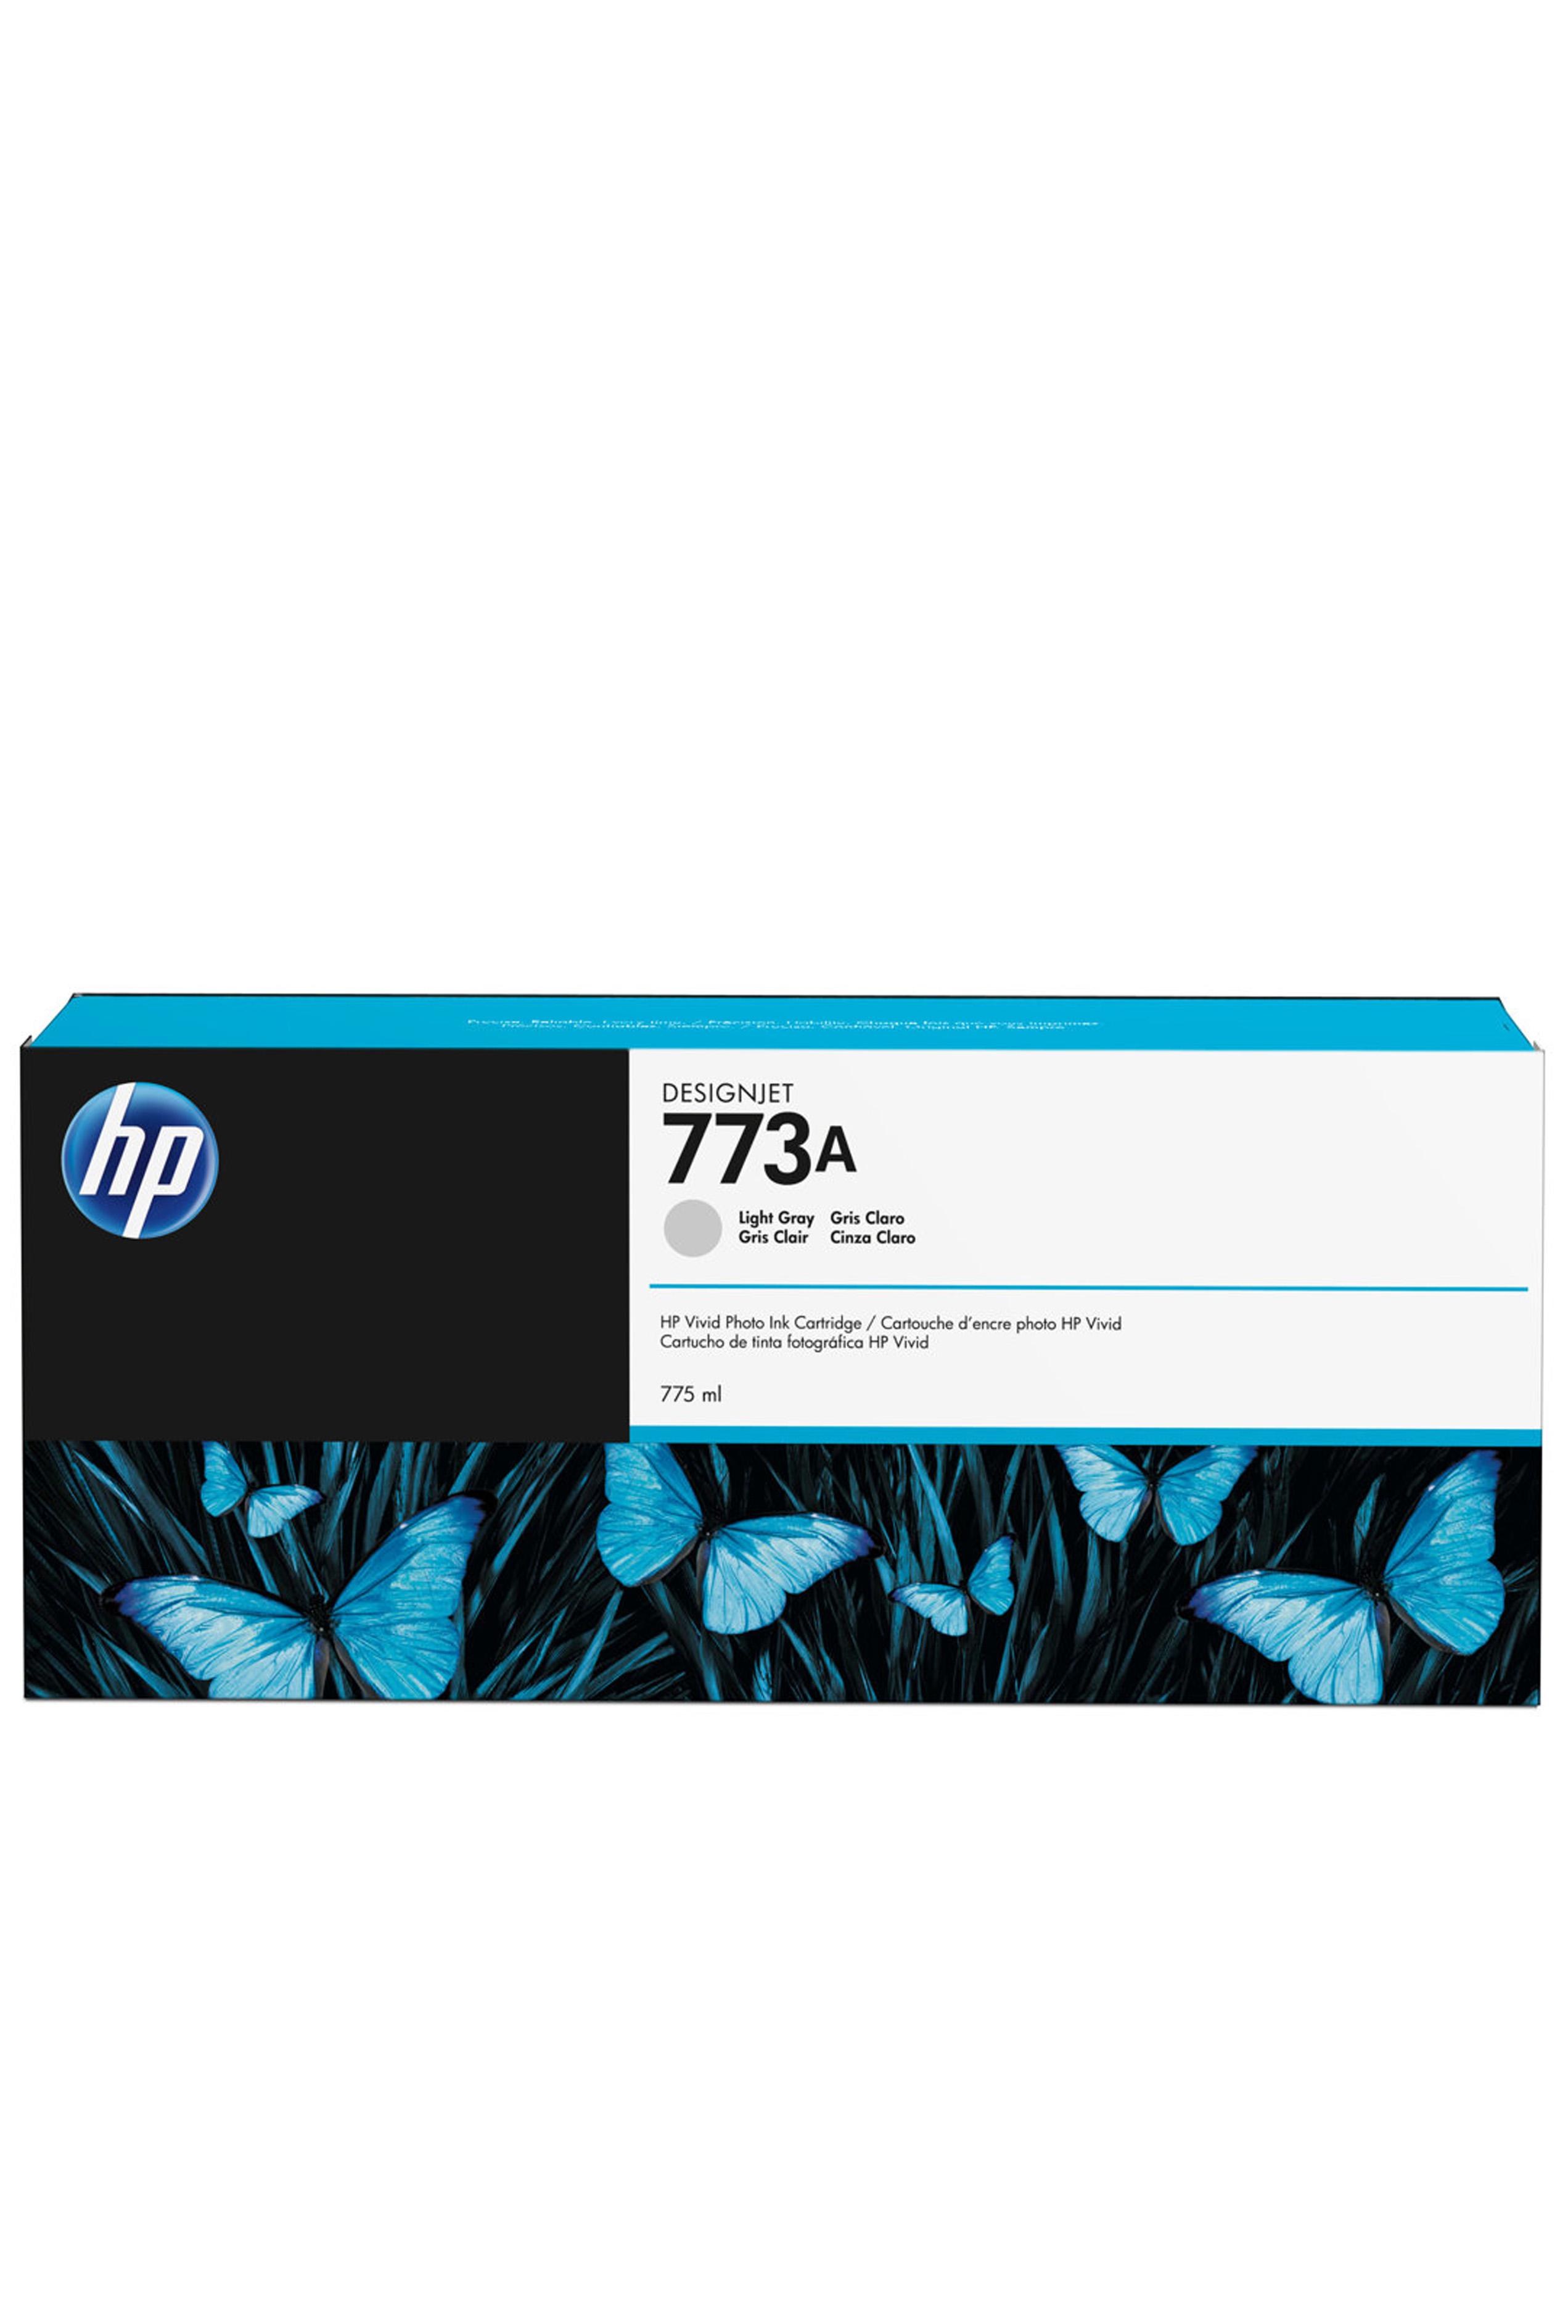 HP 773A (C1Q28A) Light Gray...